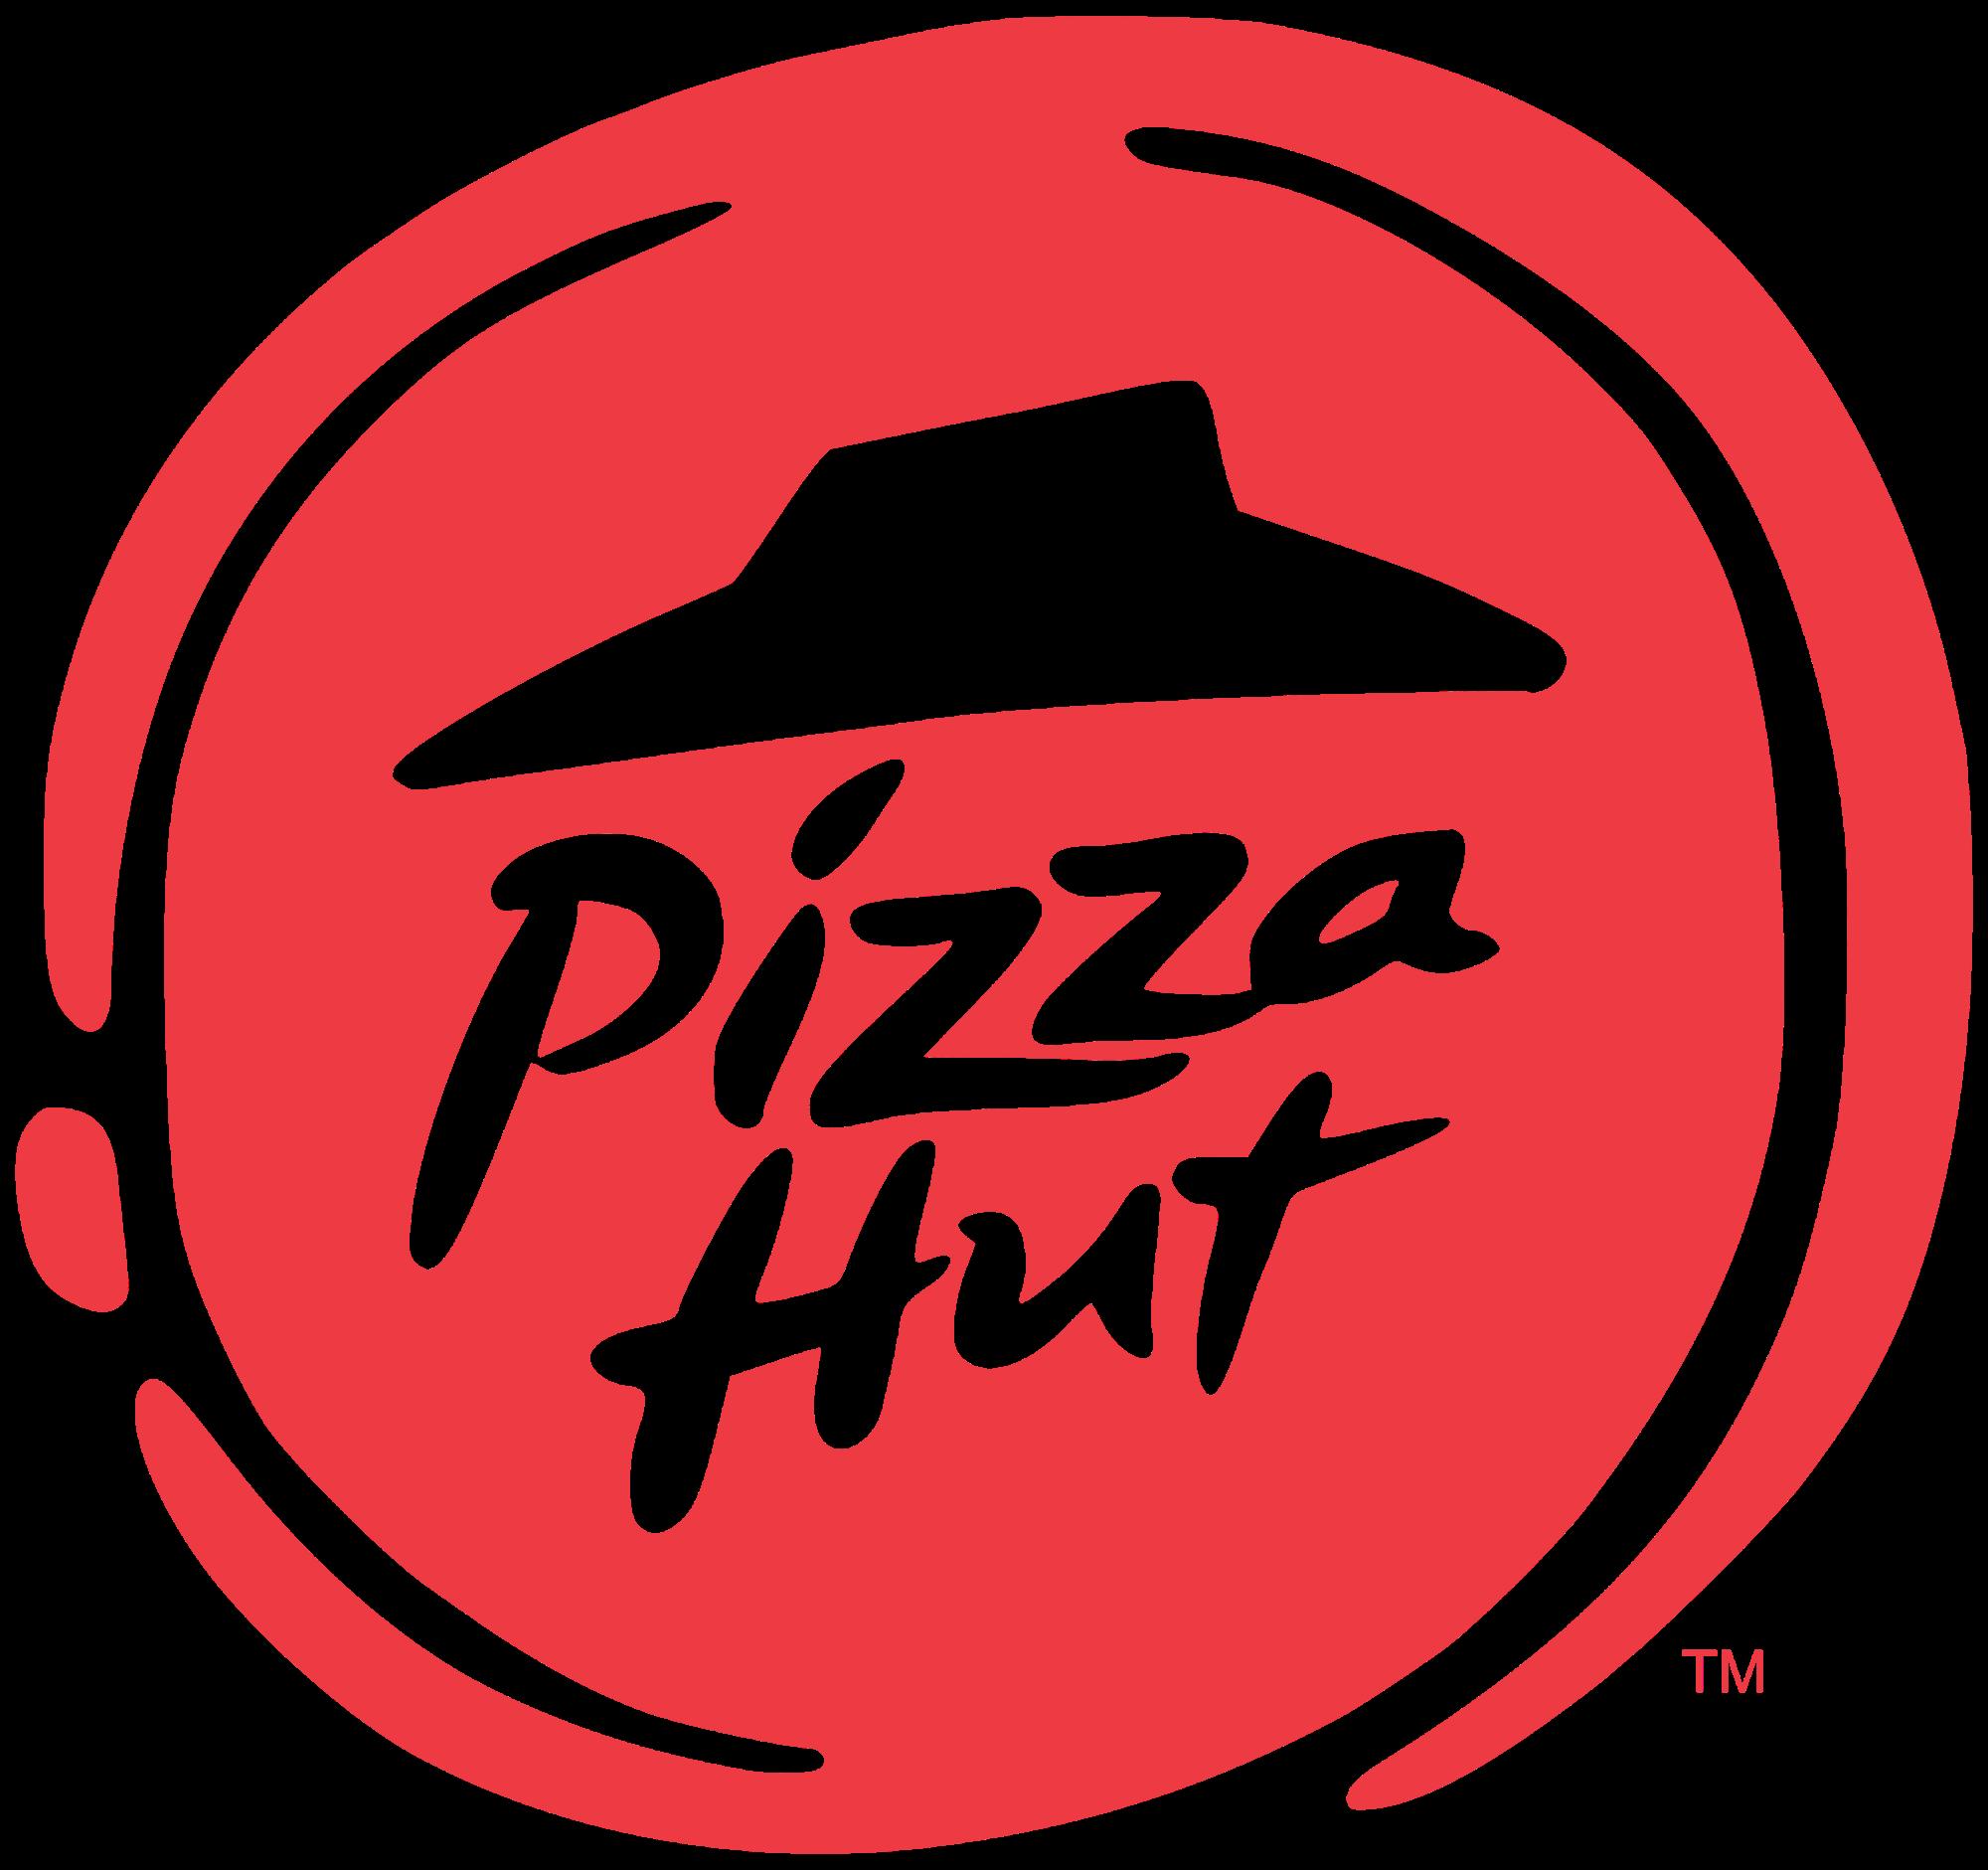 Pizza Hut – Logos Download - Pizza Hut, Transparent background PNG HD thumbnail